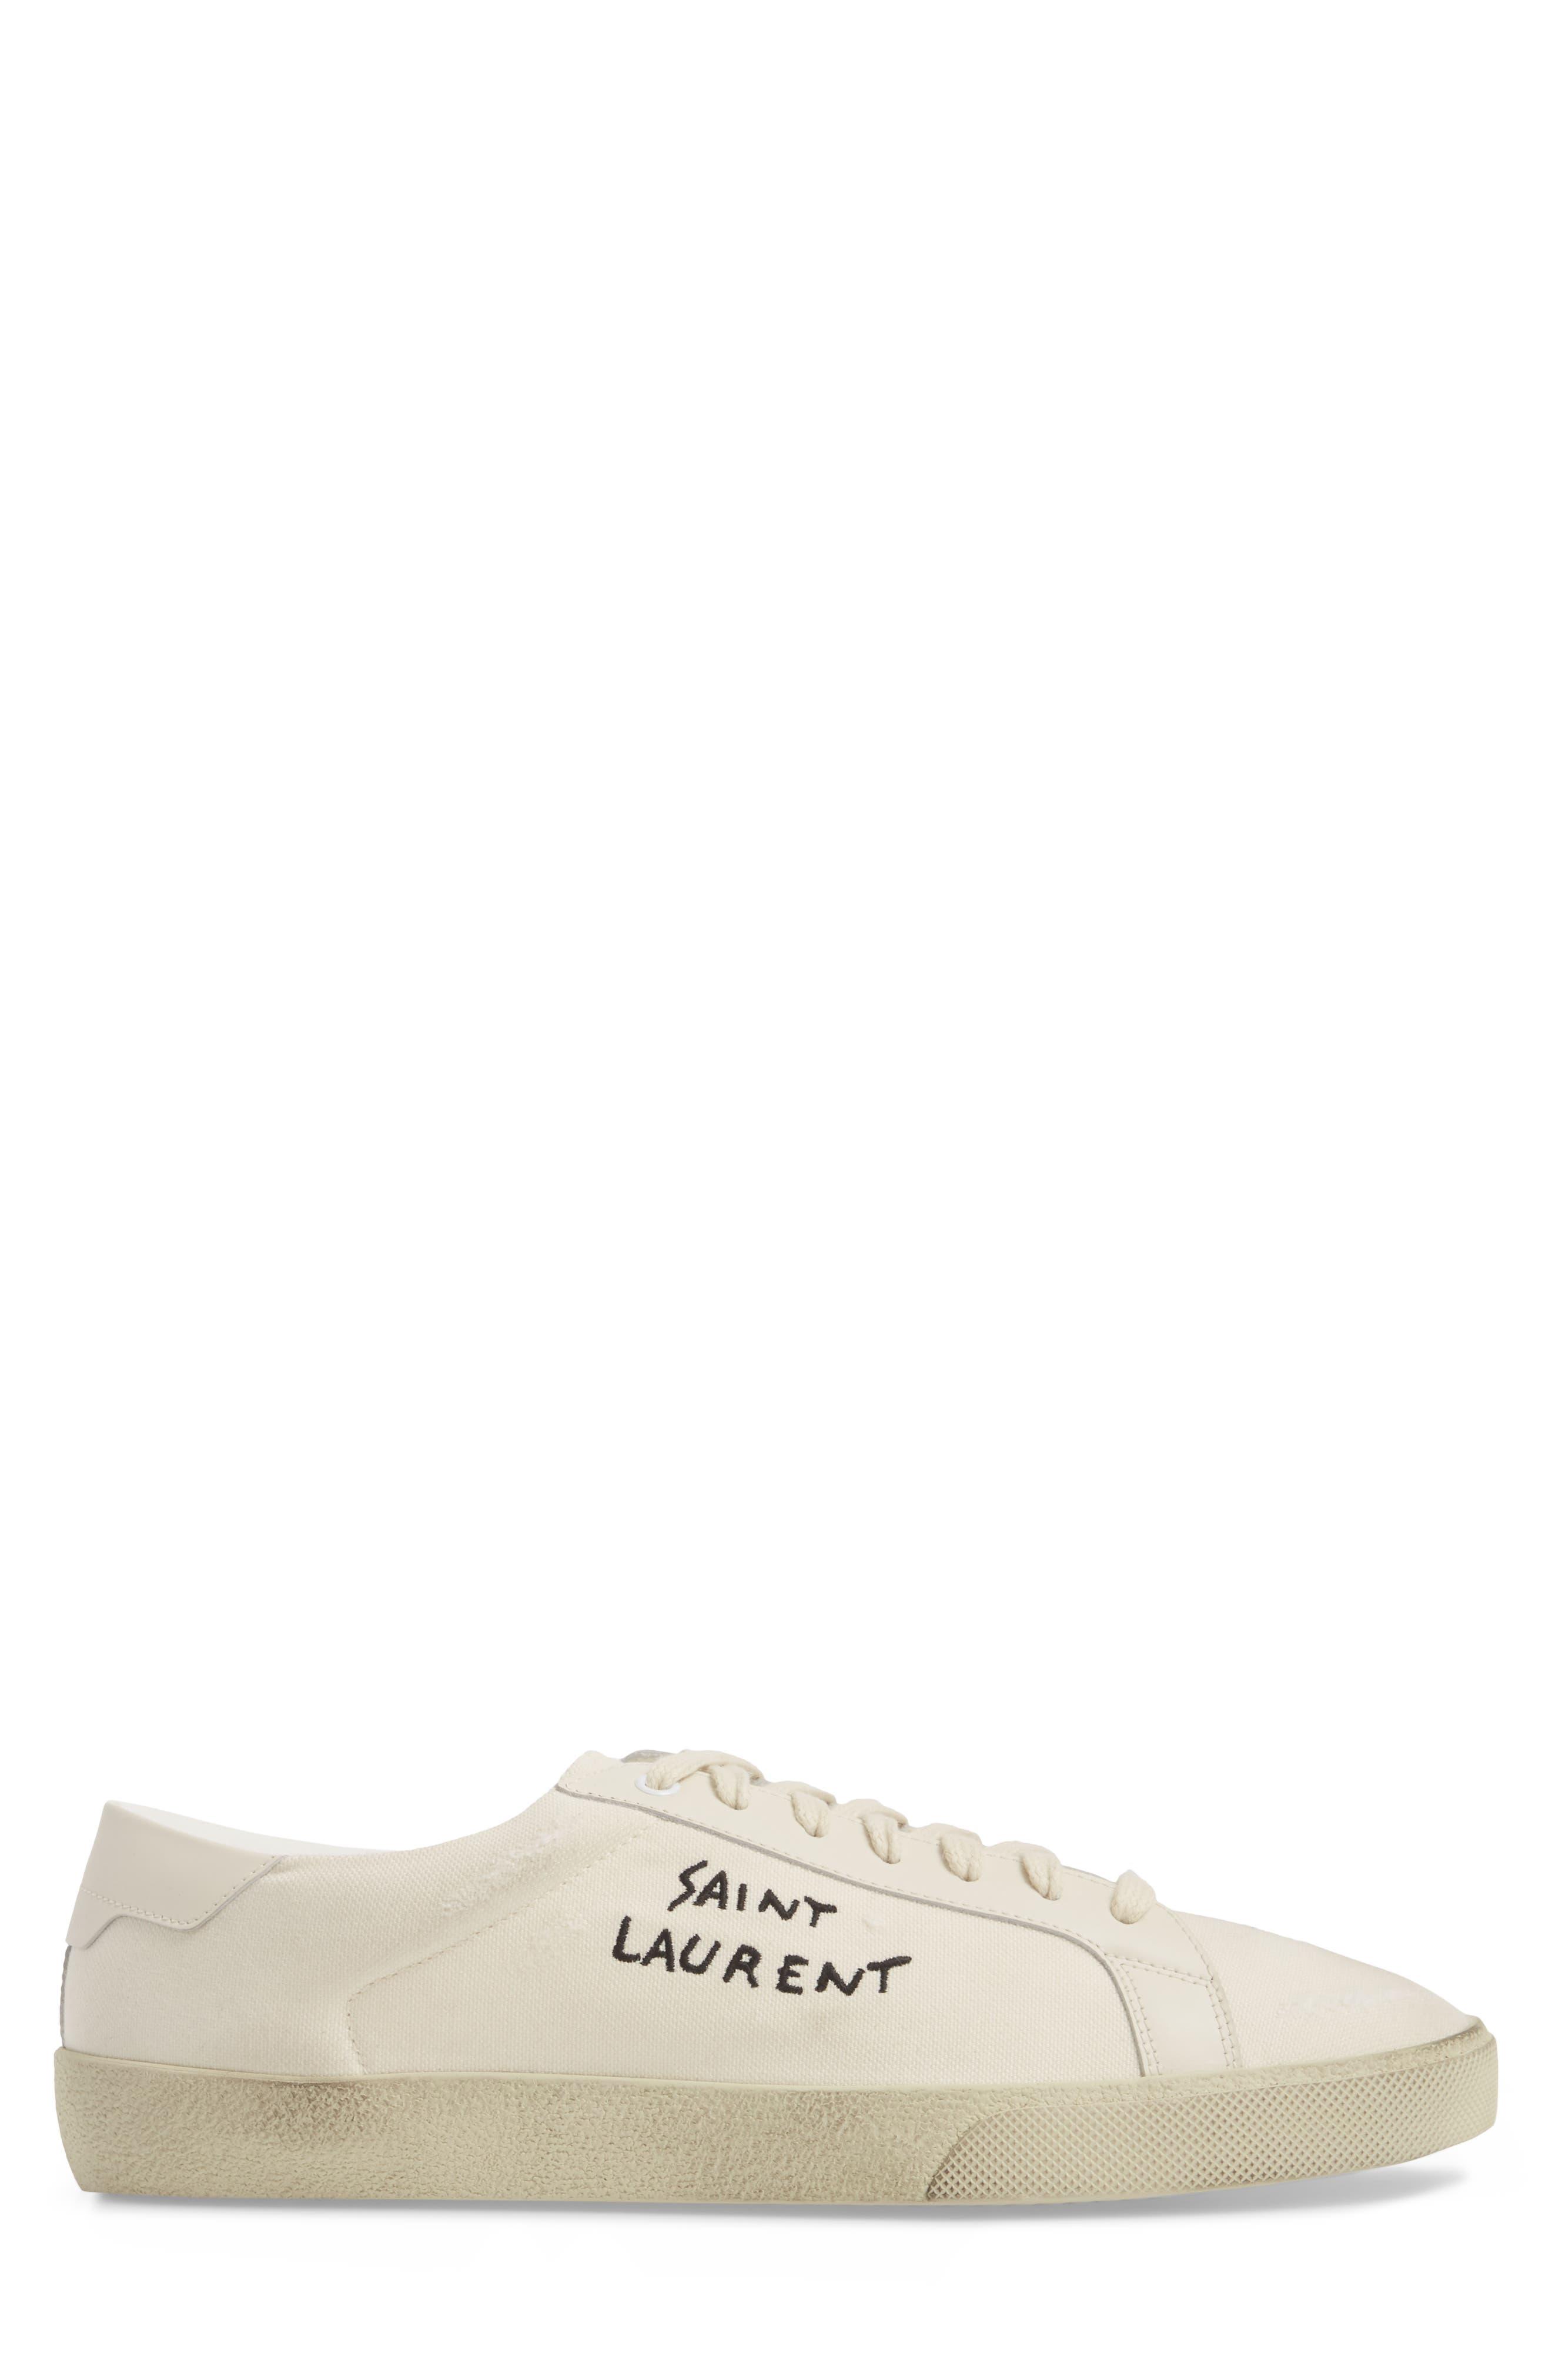 SAINT LAURENT,                             Logo Embroidered Sneaker,                             Alternate thumbnail 3, color,                             9113 PANNA/PANNA